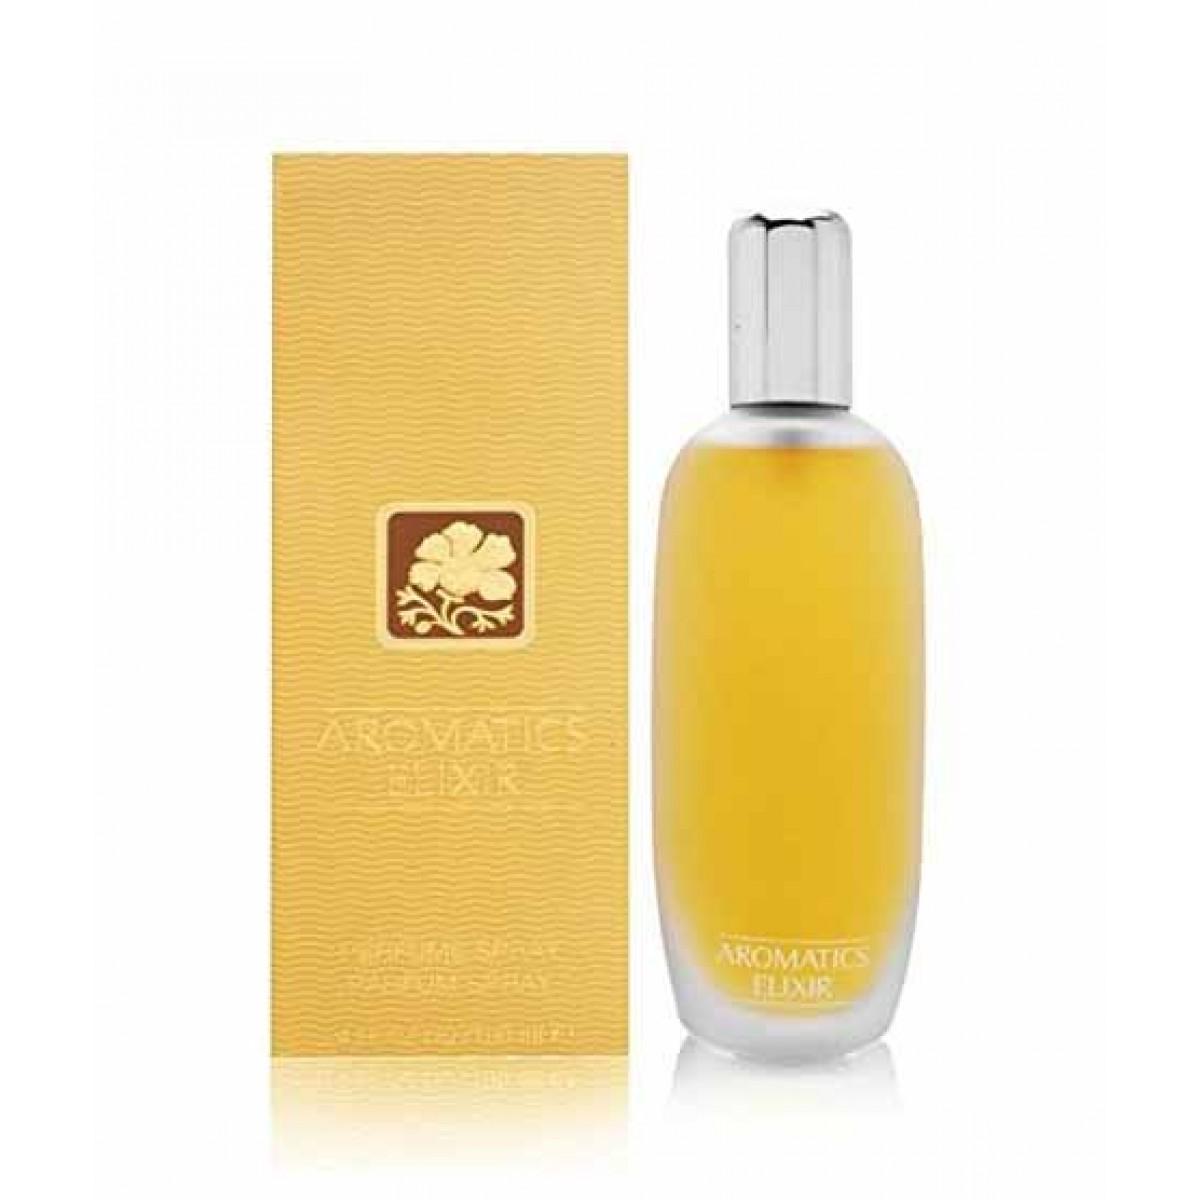 Clinique Aromatic Elixir EDP Perfume For Women 100ML